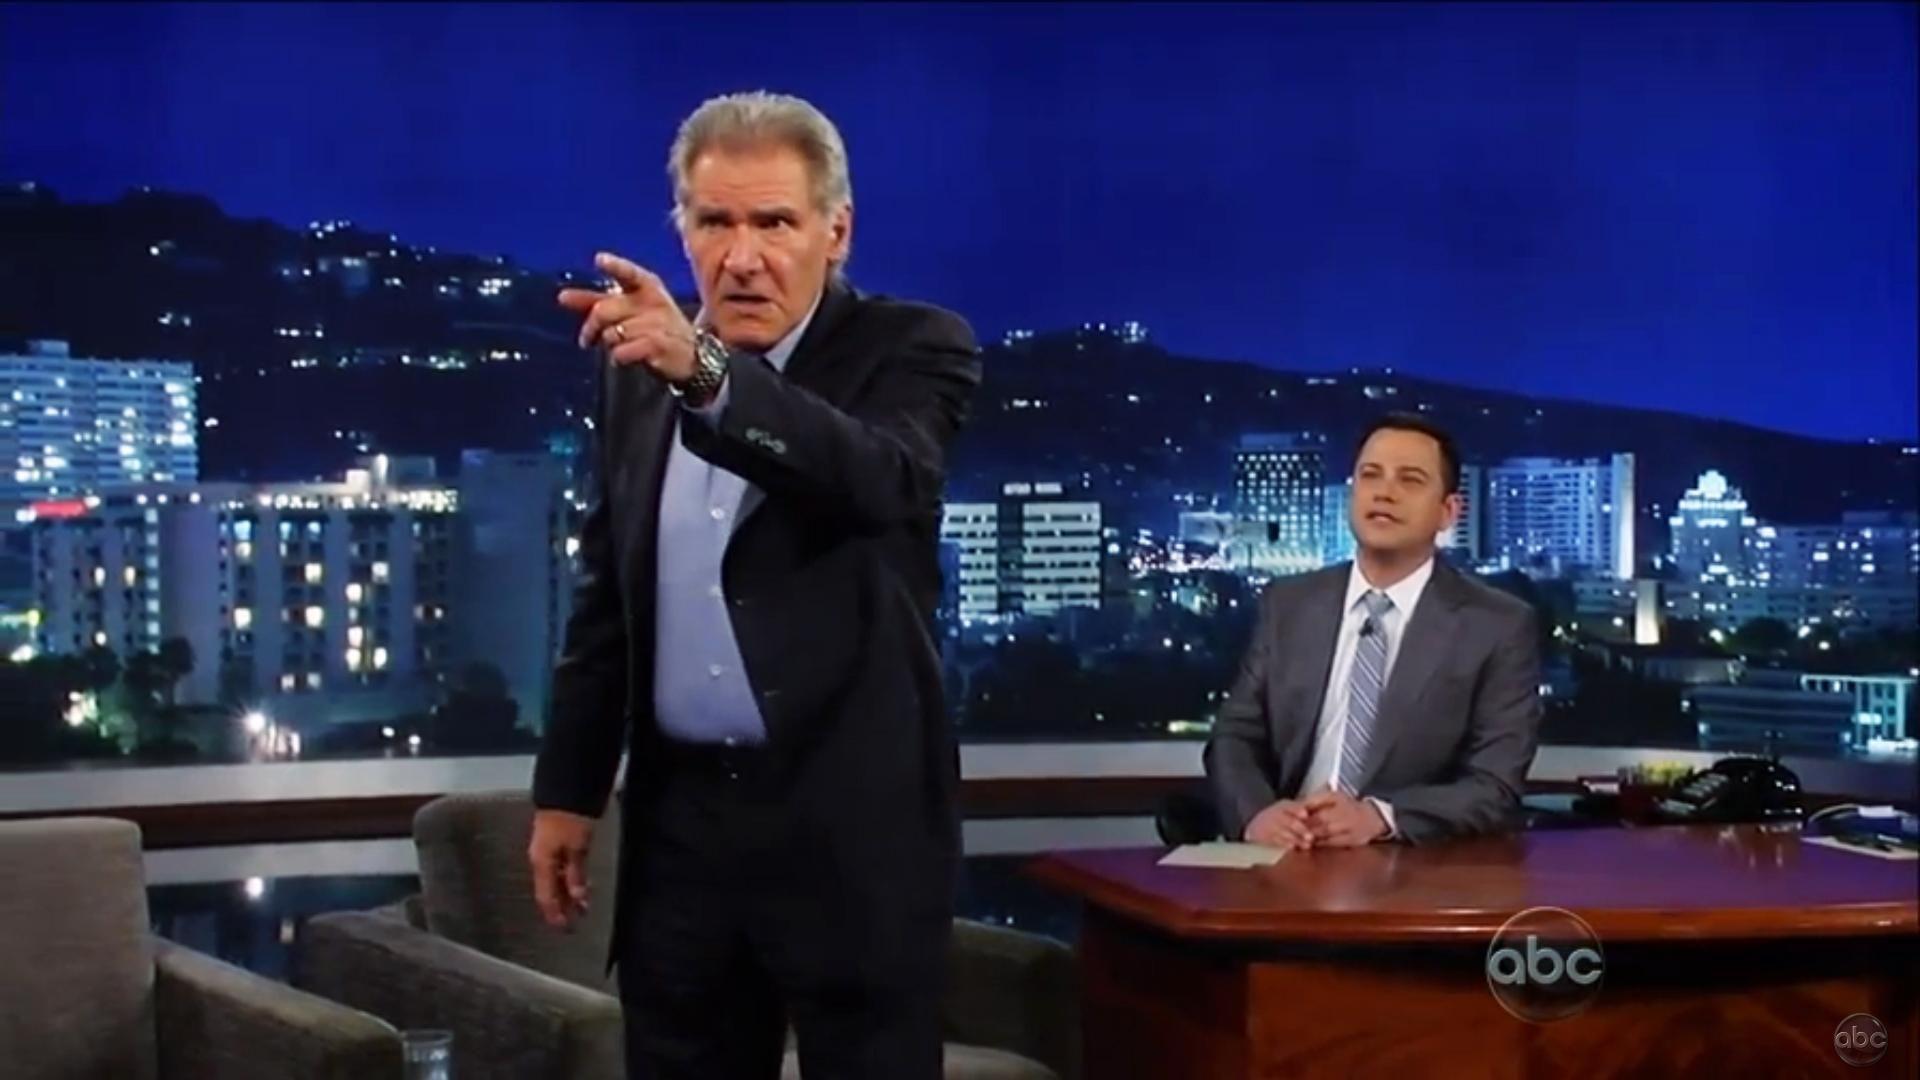 Harrison Ford se enfrenta a Chewbacca en Jimmy Kimmel Live